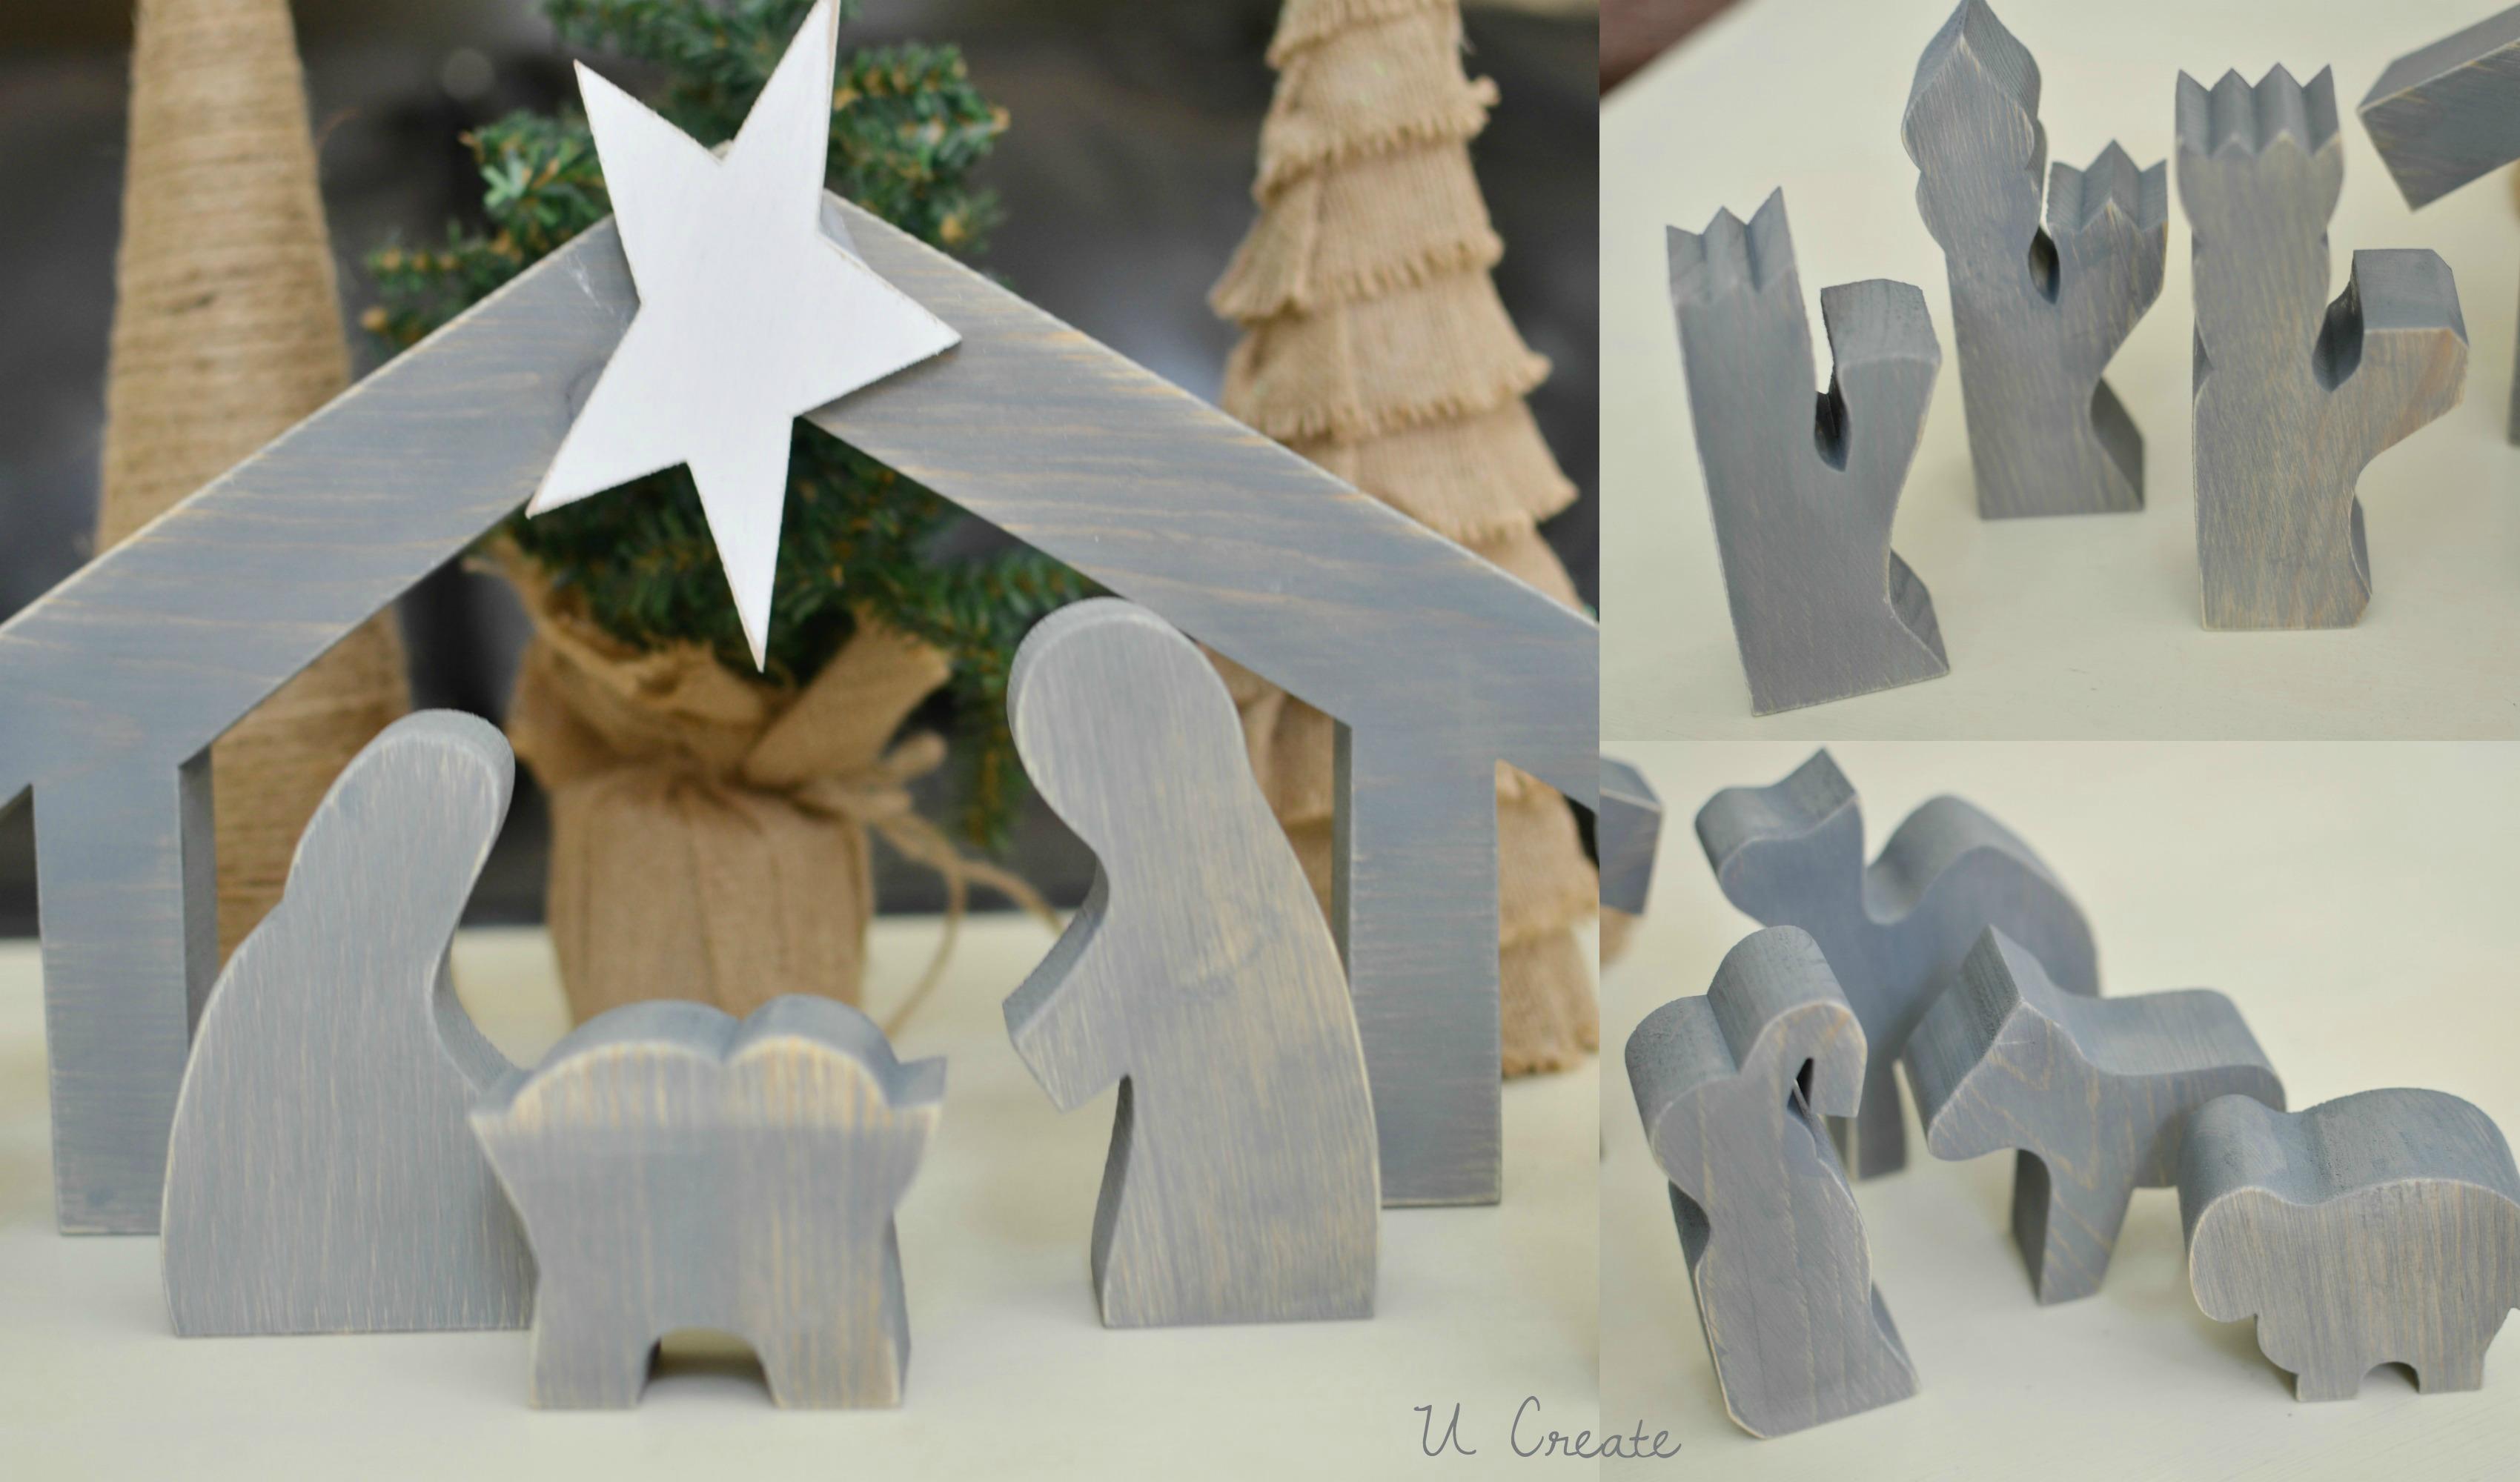 wooden navity set by u create - Wooden Nativity Set